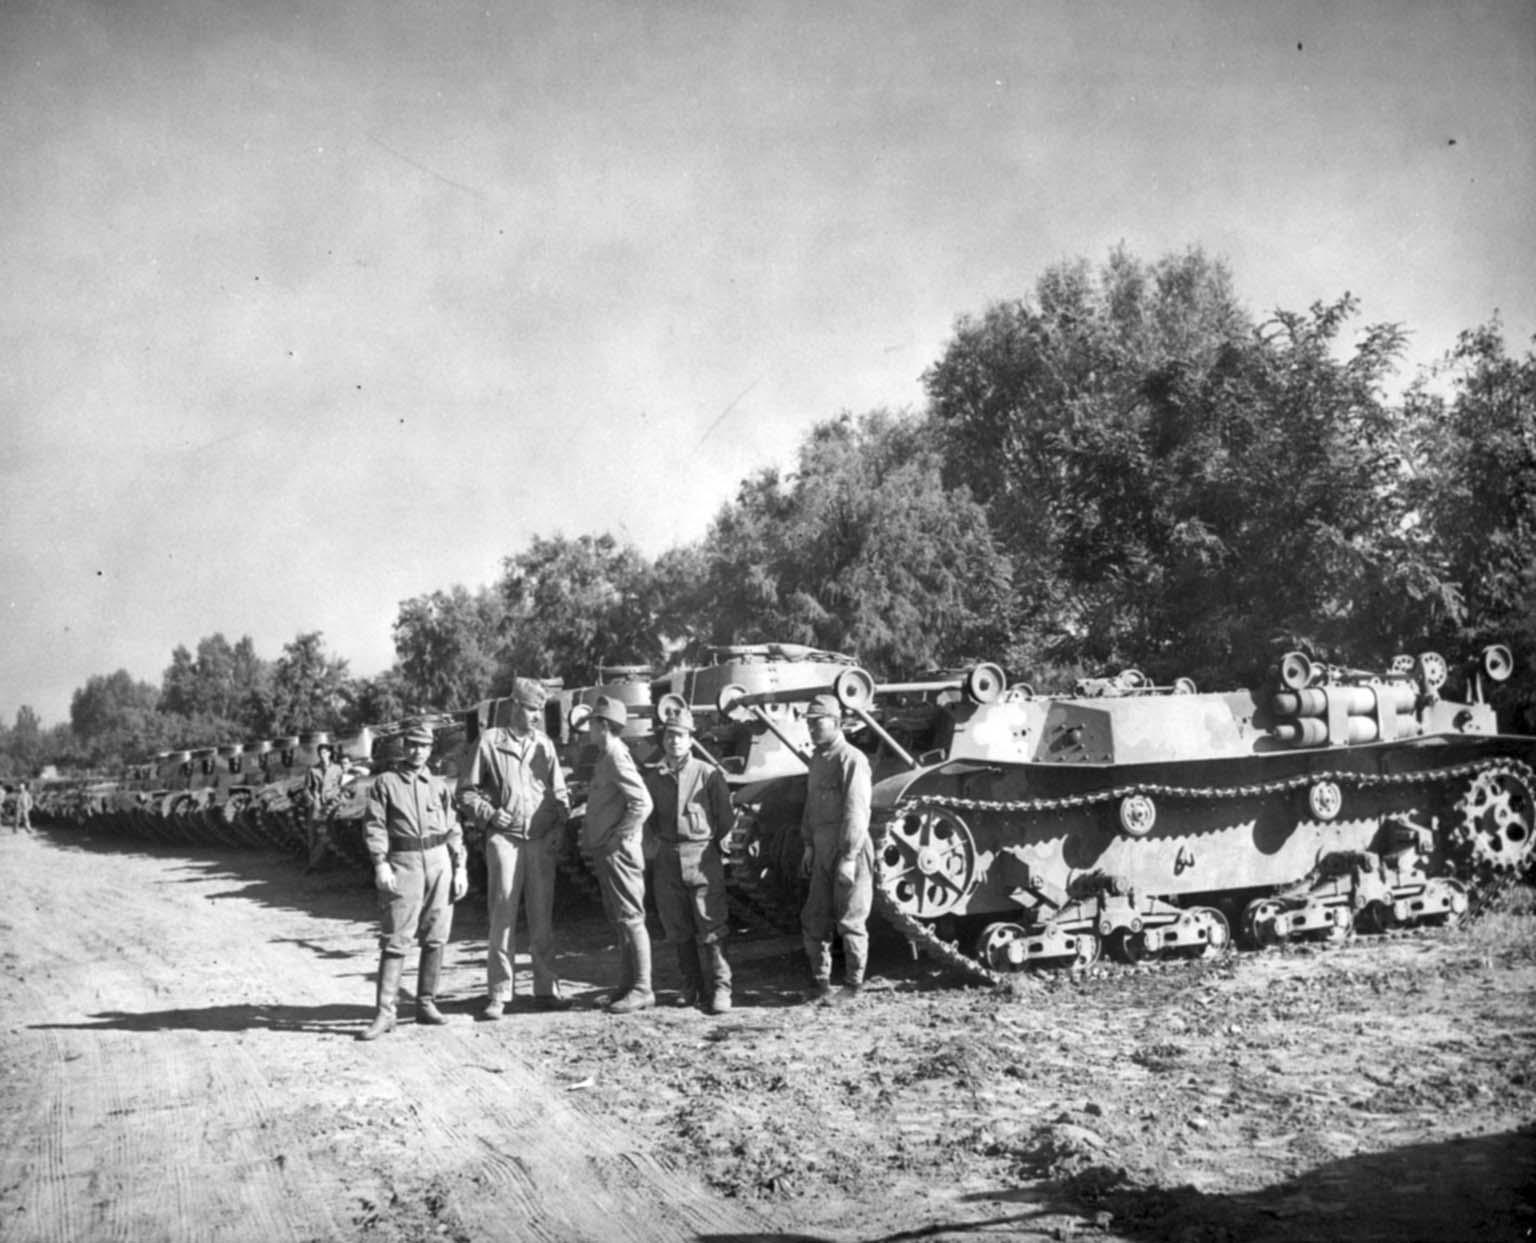 Japanese tank unit